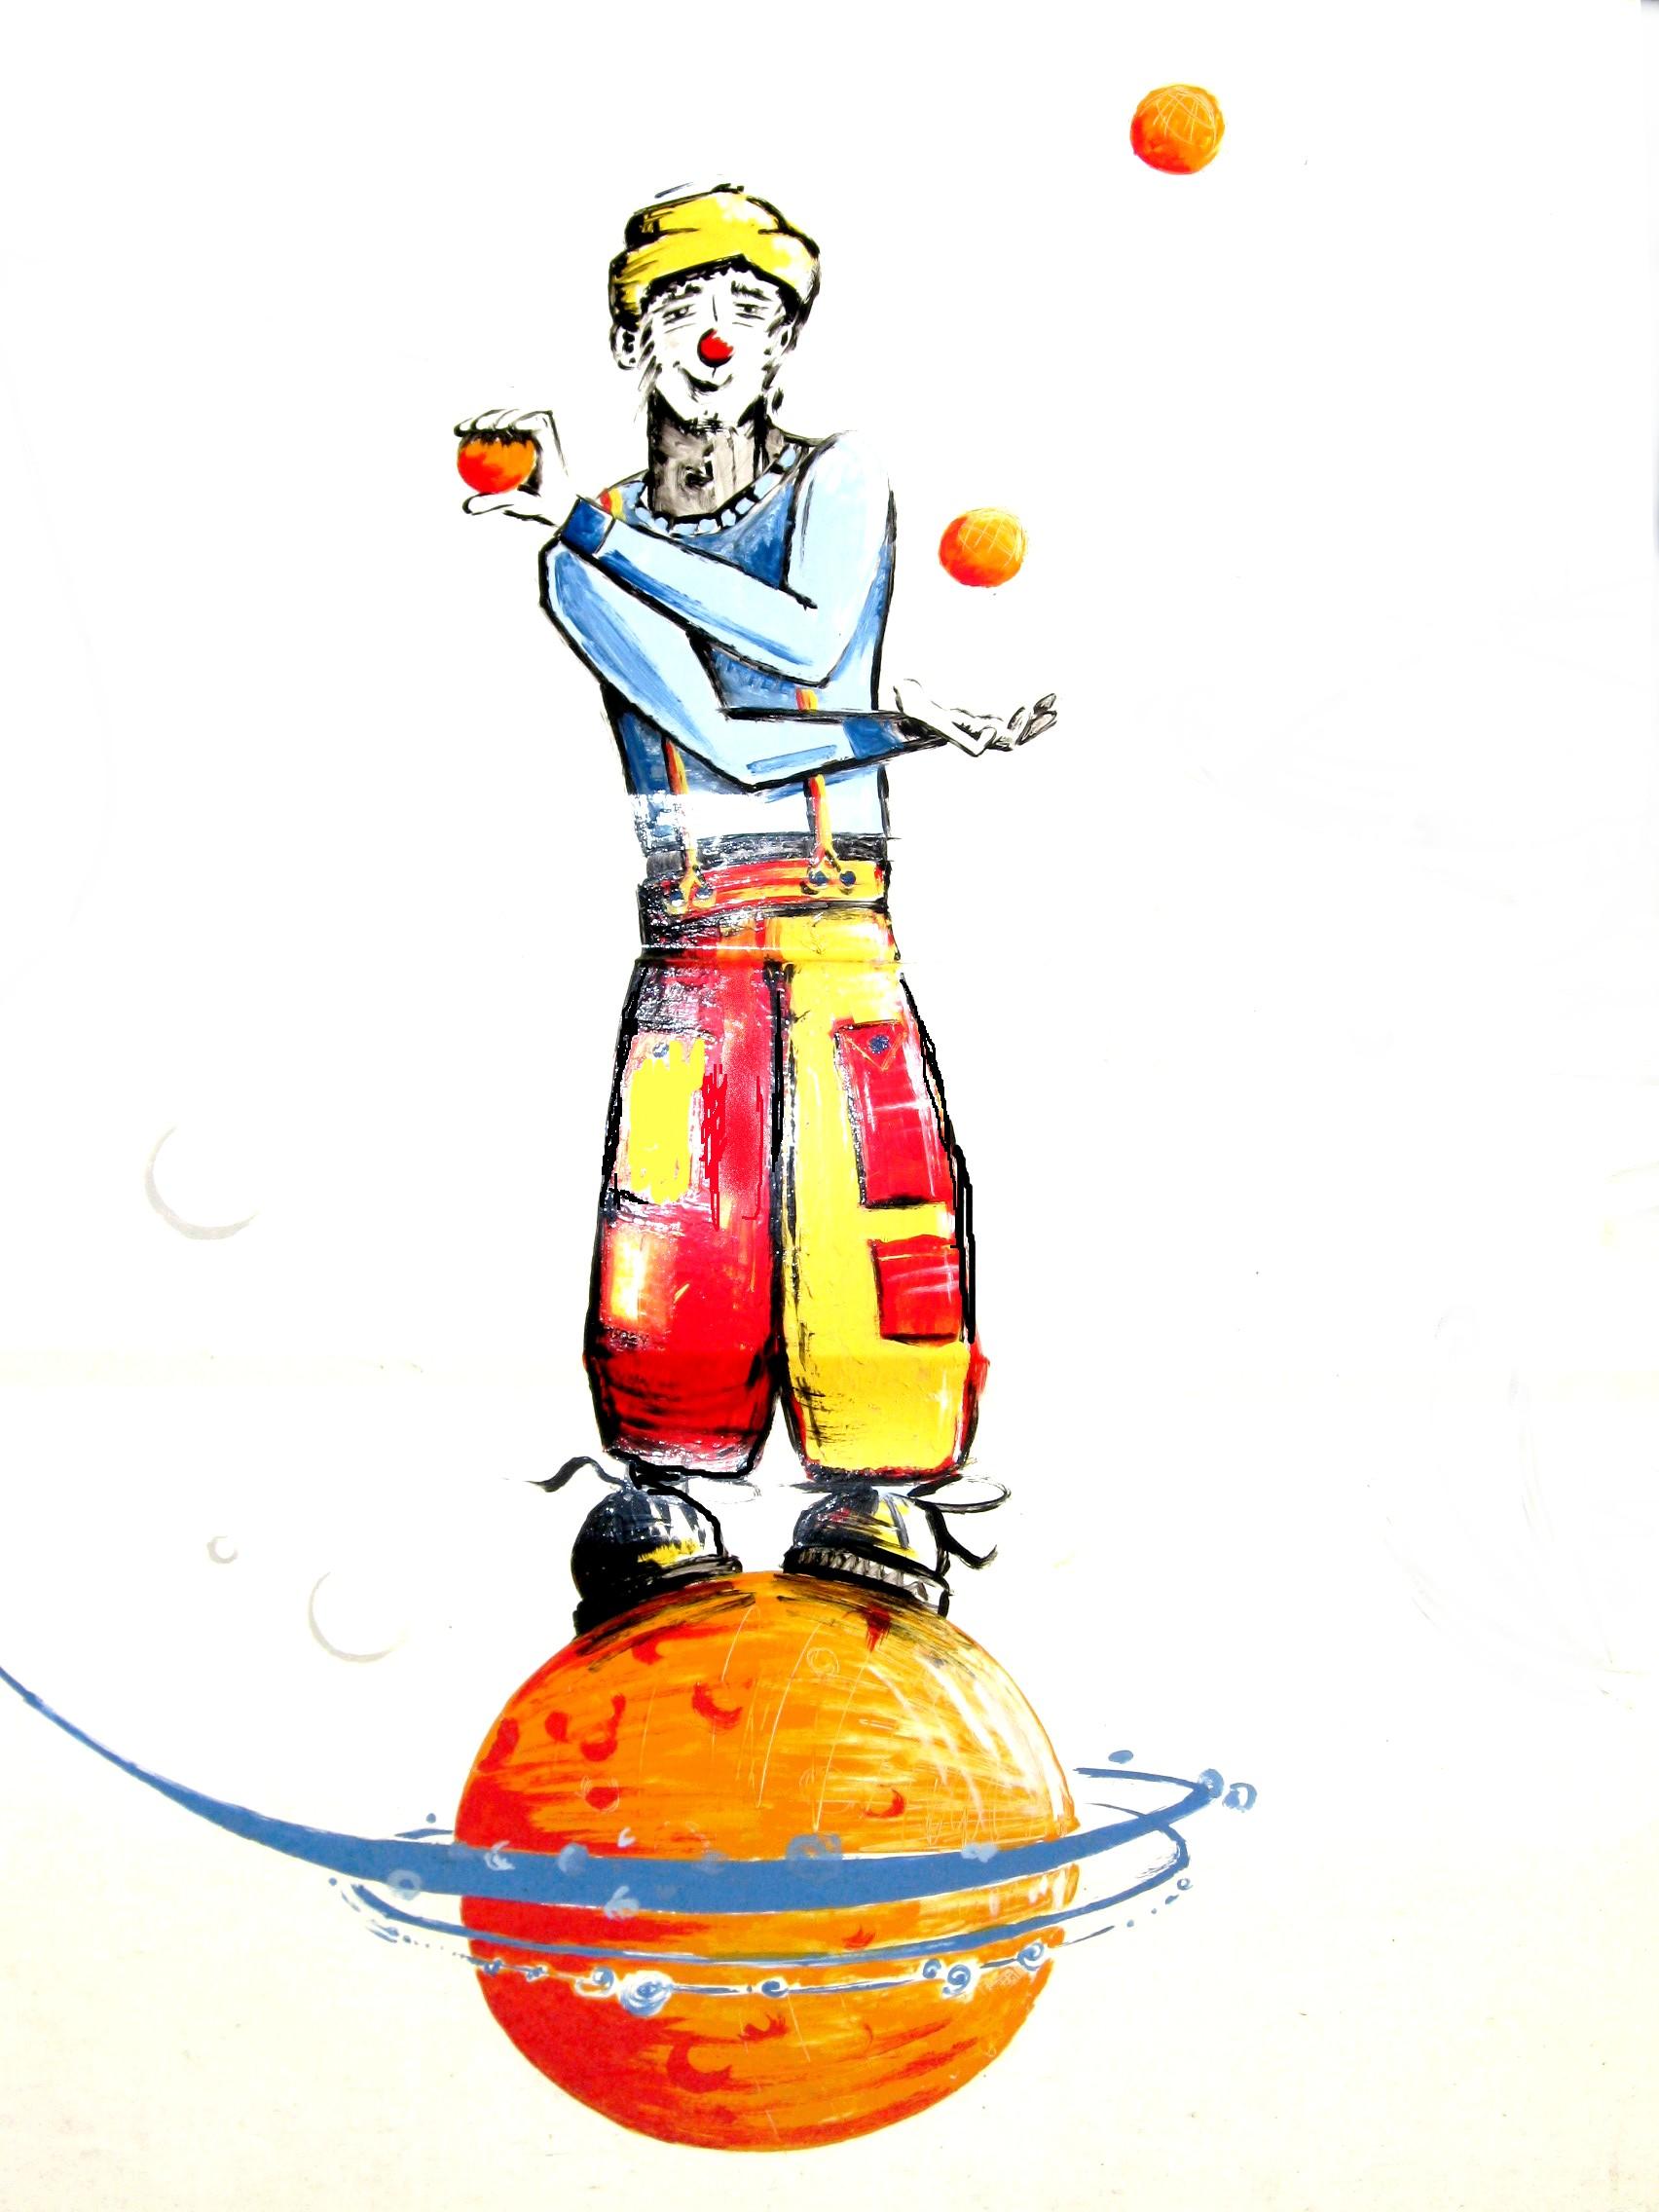 Projet cirque - Image jongleur cirque ...